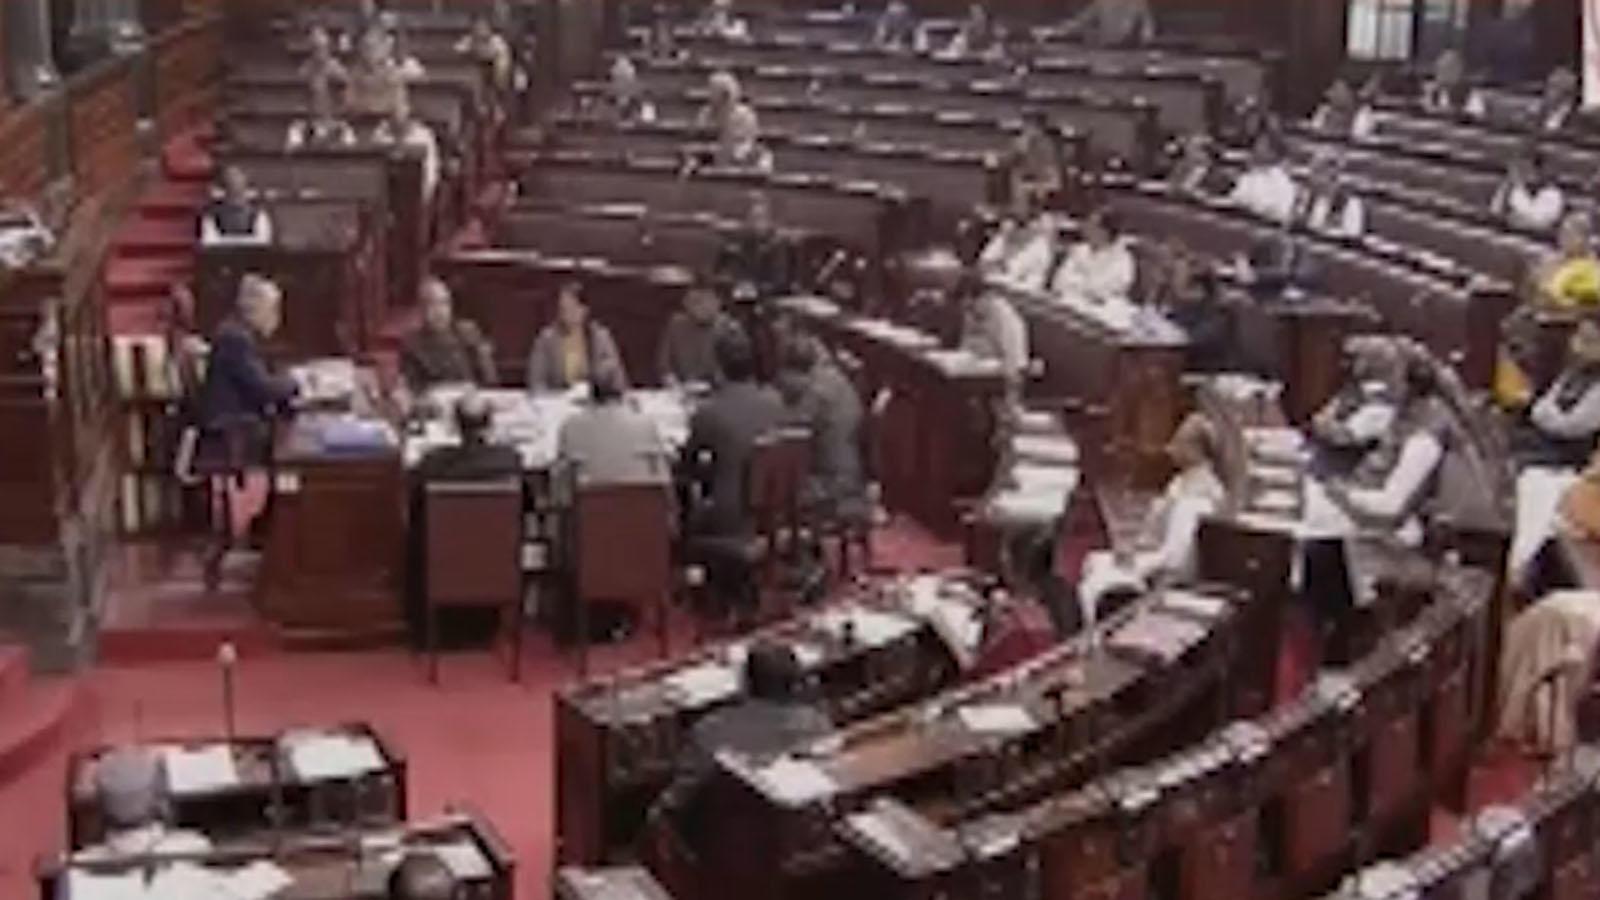 mps-fail-to-attend-debate-on-rape-in-rajya-sabha